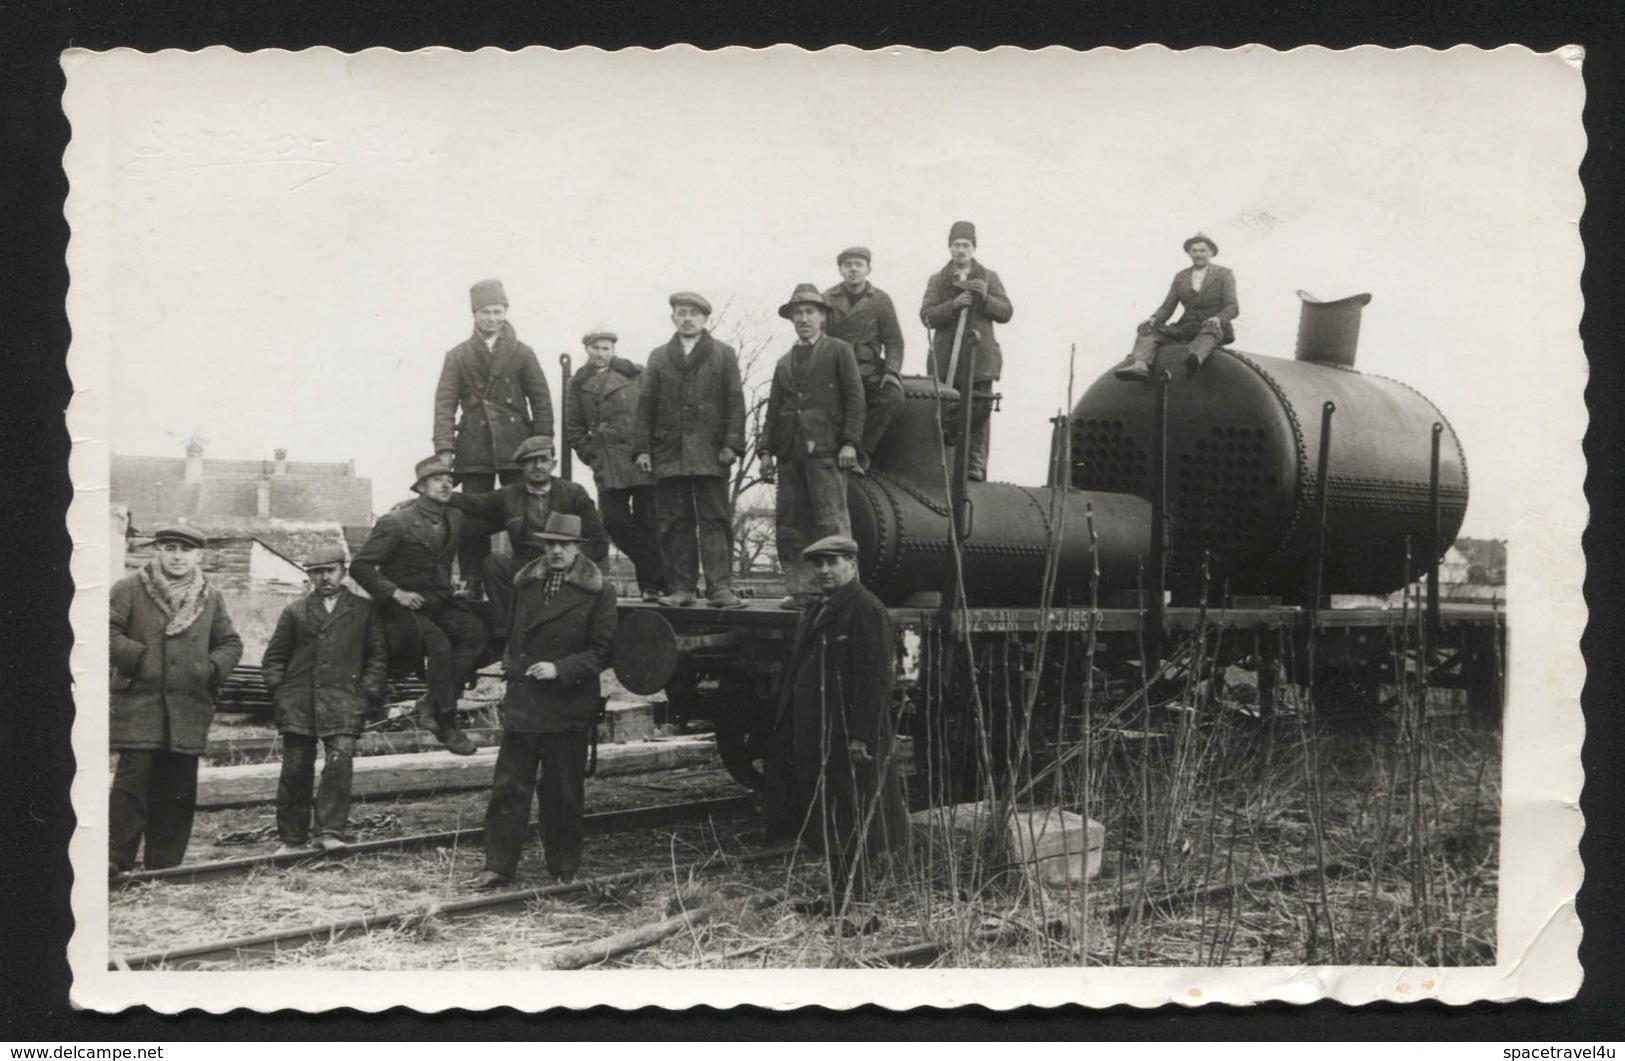 YUGOSLAVIA  - VINTAGE PHOTO POSTCARD - Old Locomotive, 1939.  (APAT#04) - Yugoslavia